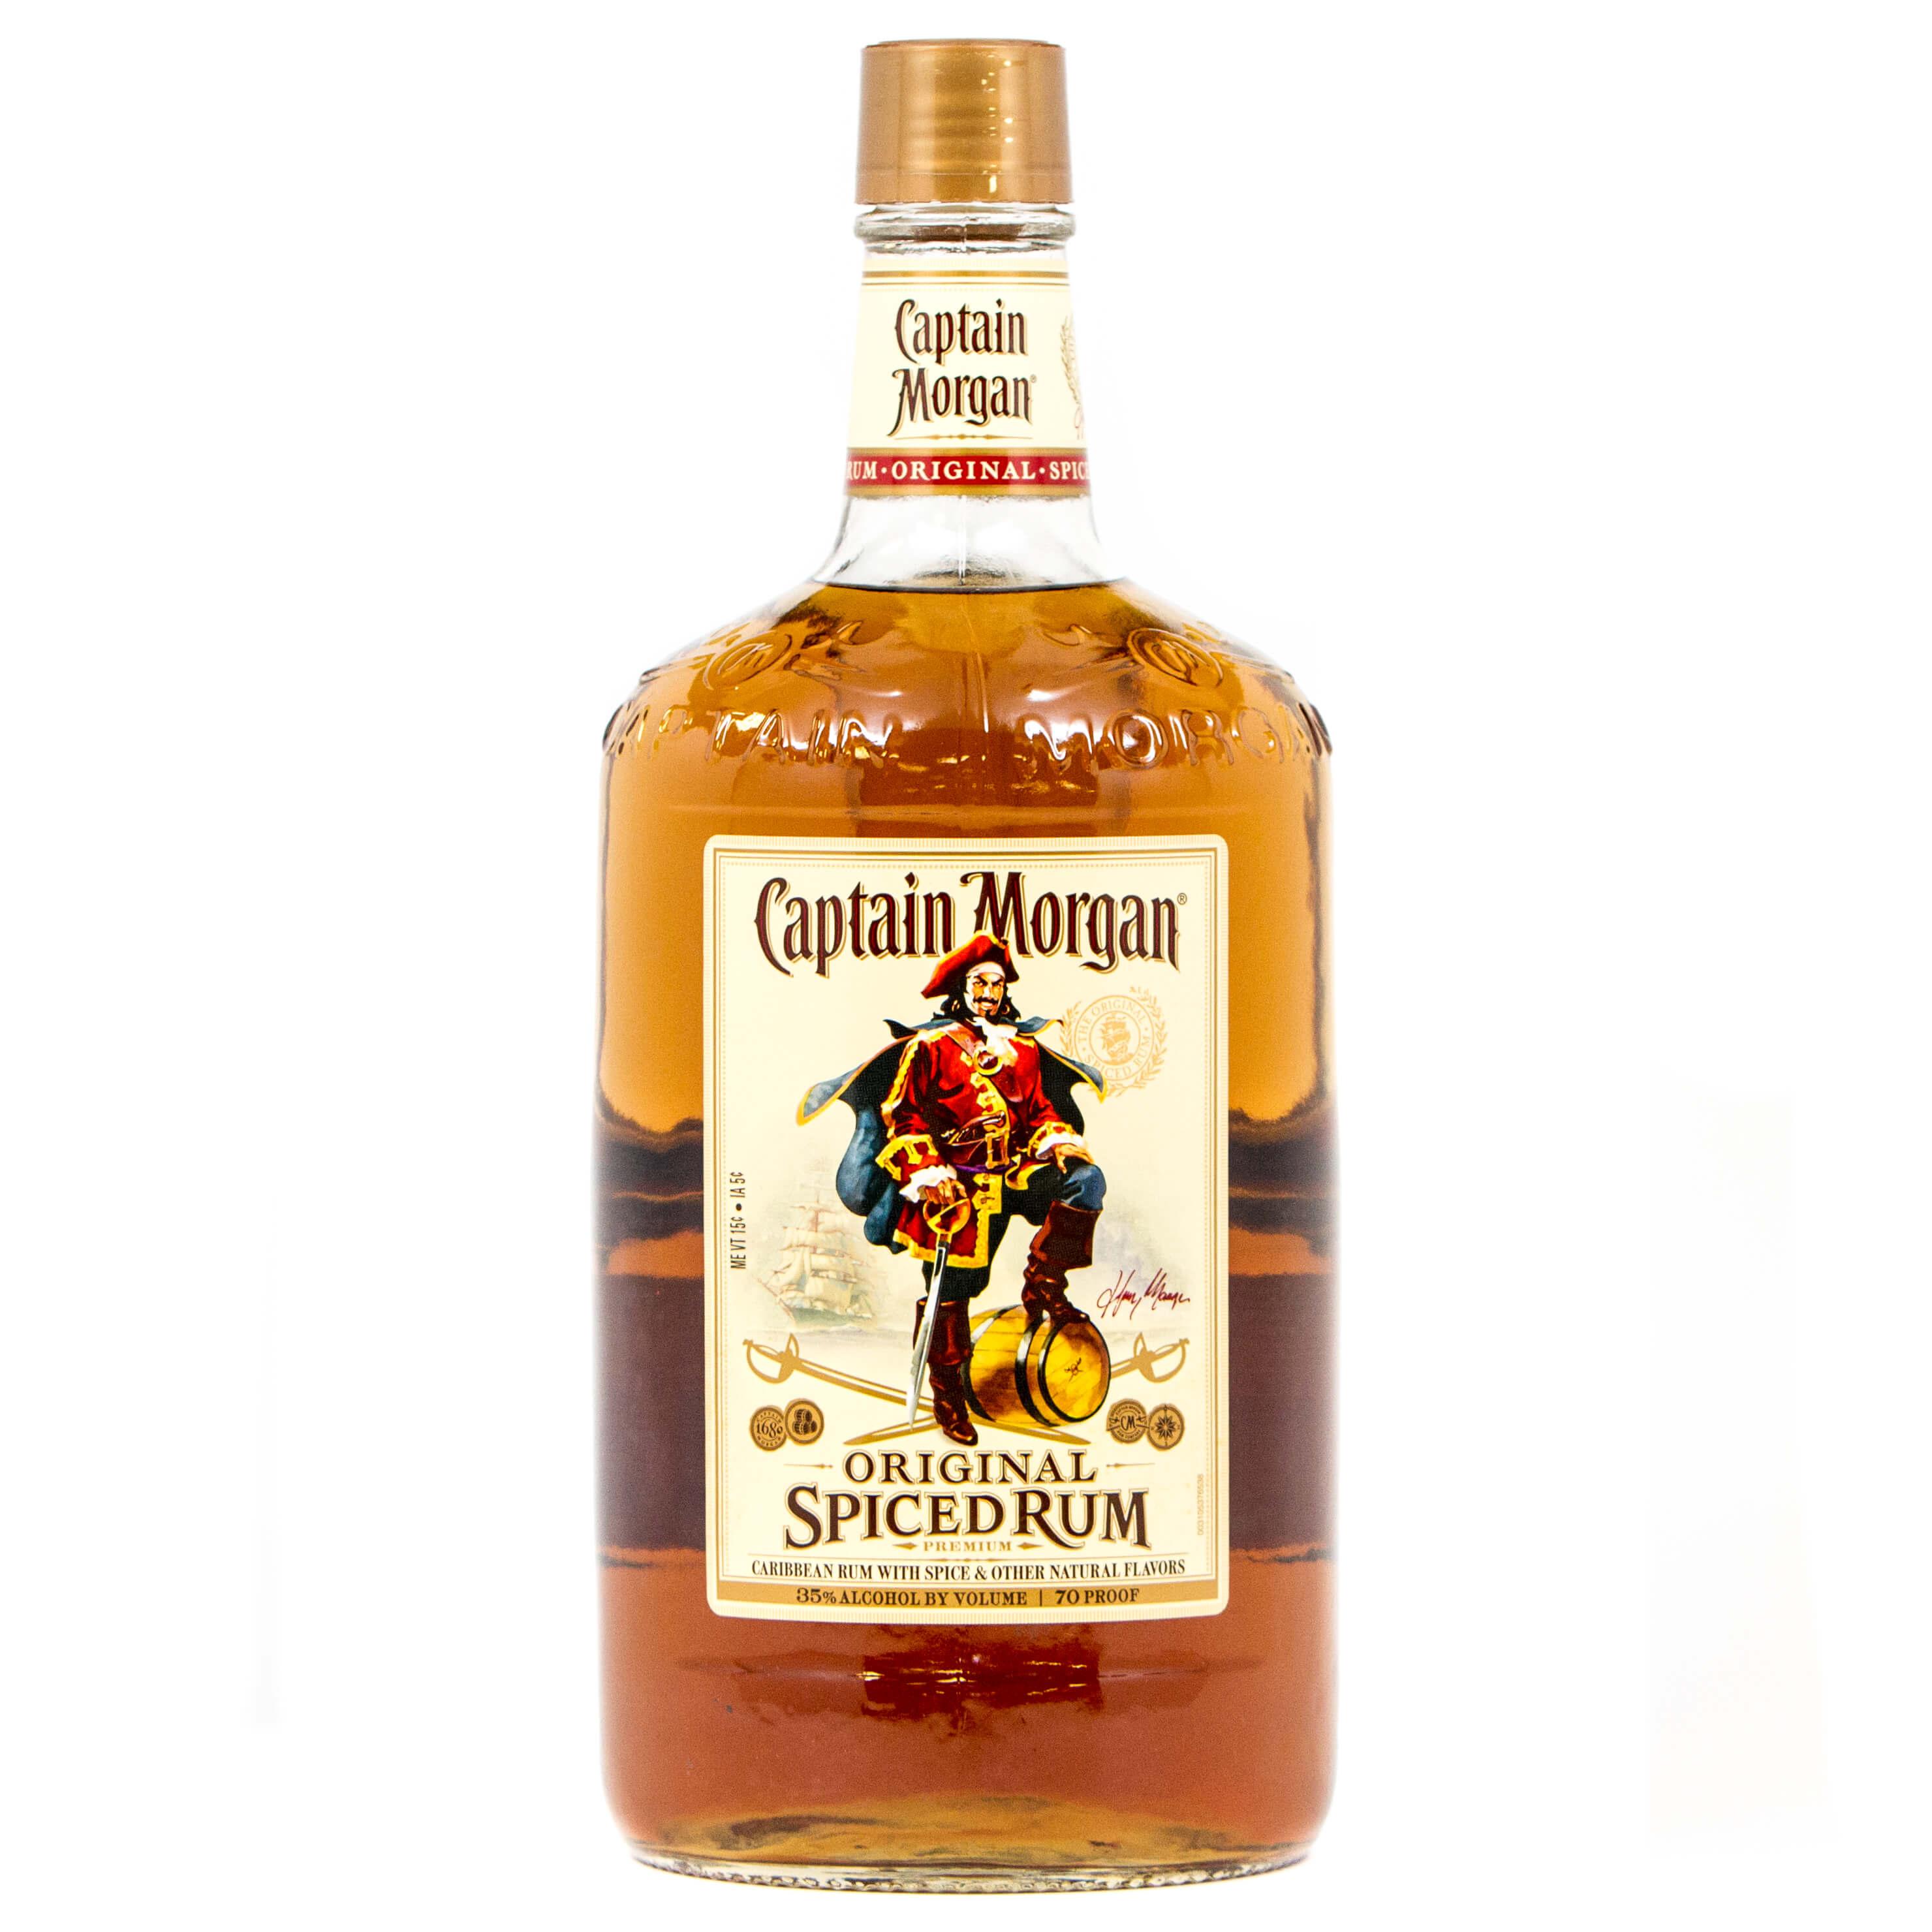 Captain Morgan #5